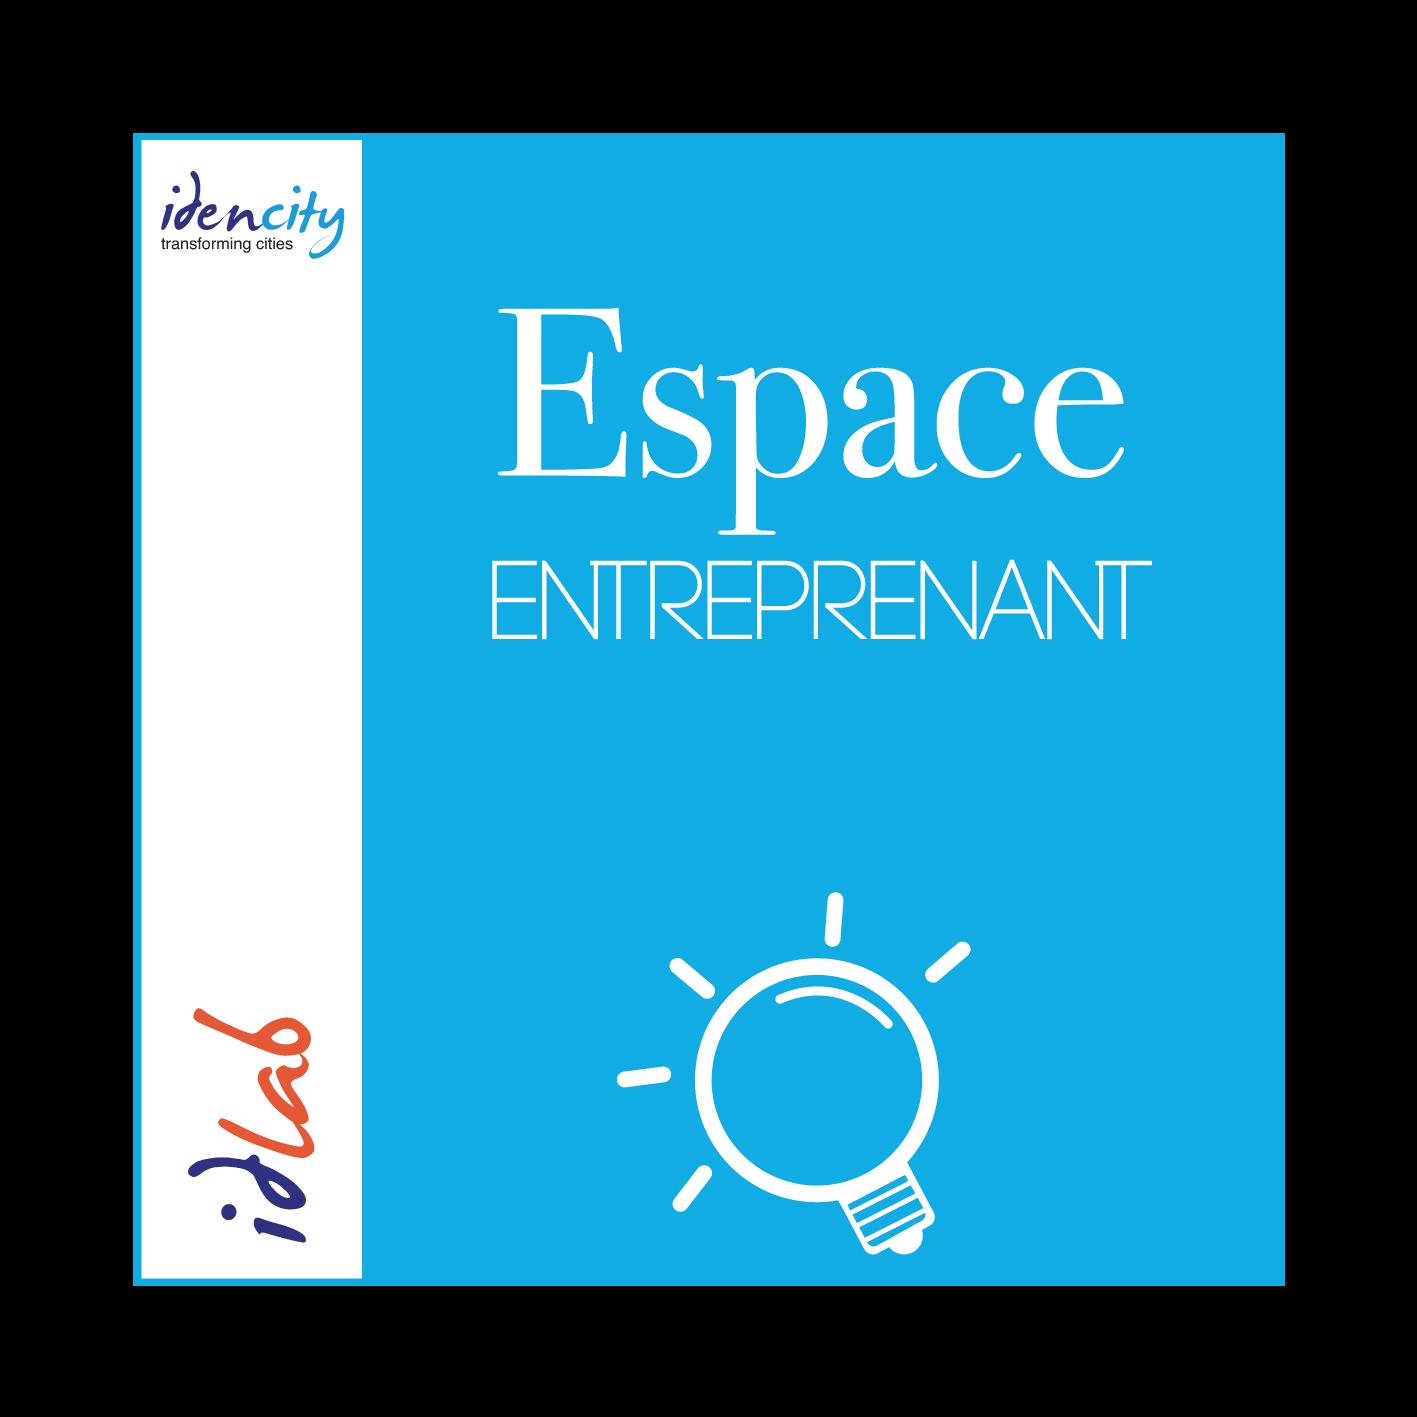 Espace Entreprenant - Idencity